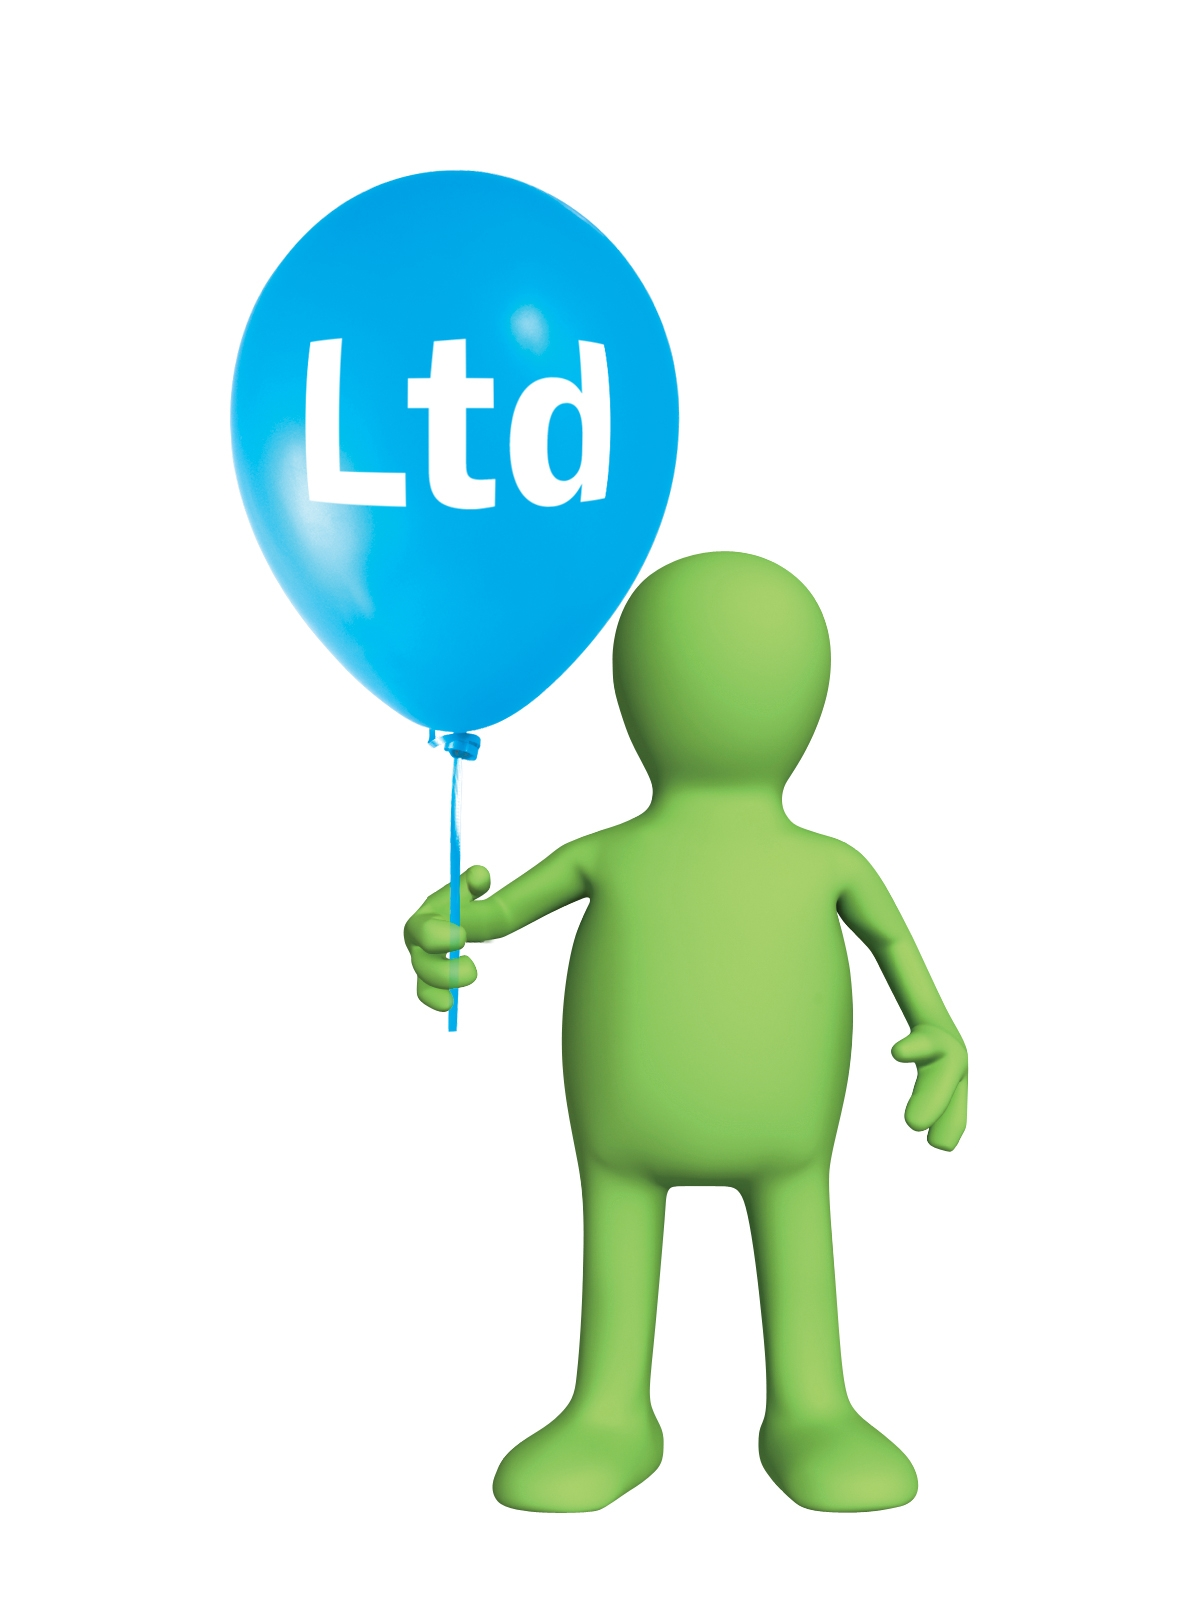 Do you think I should be Ltd?